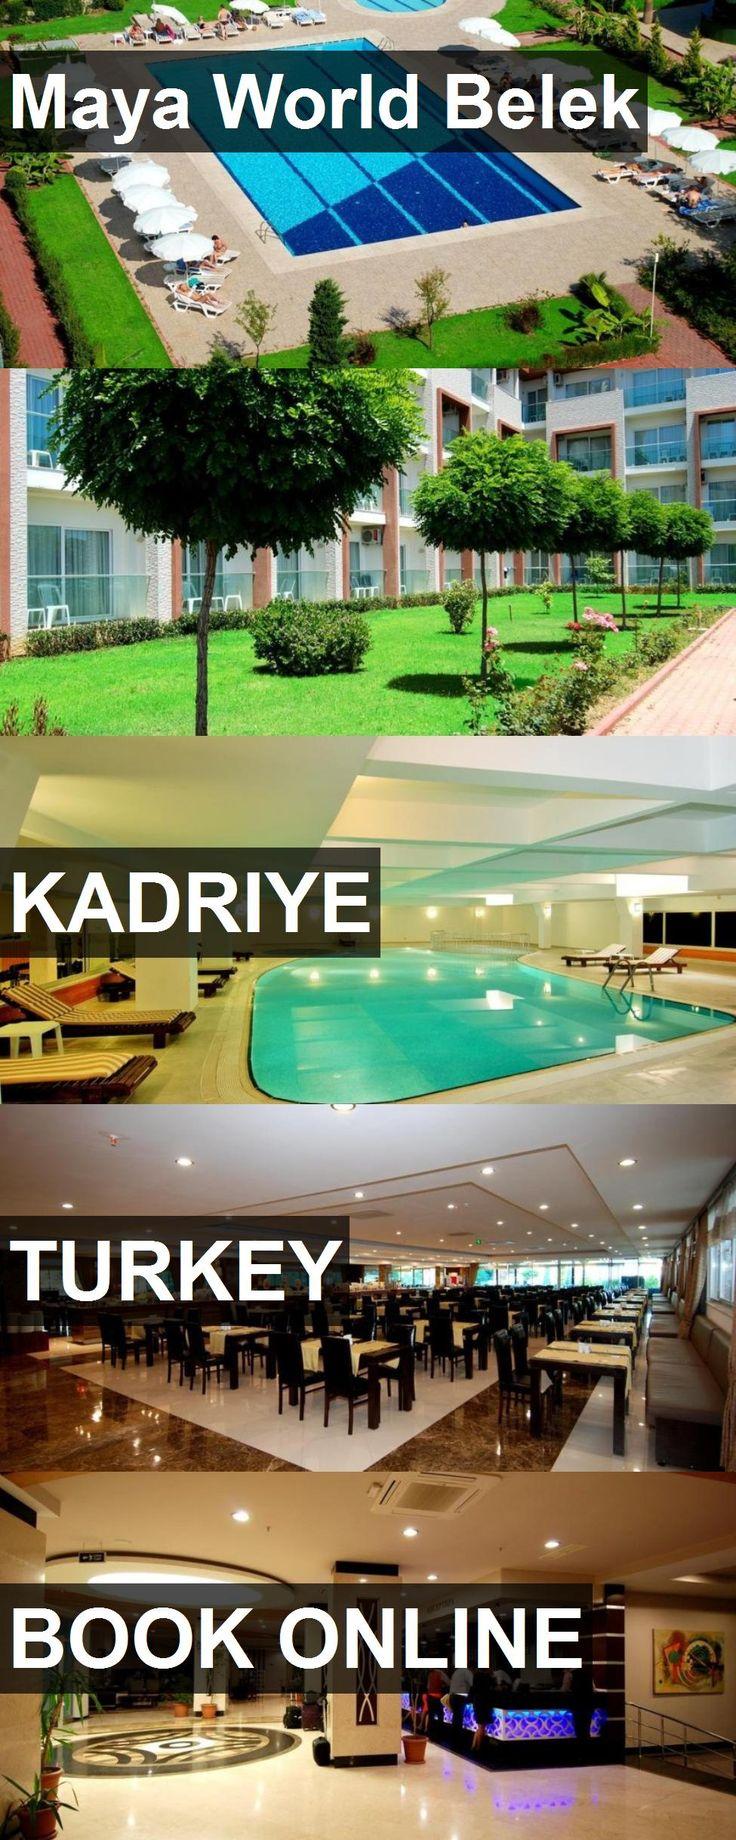 Hotel Maya World Belek in Kadriye, Turkey. For more information, photos, reviews and best prices please follow the link. #Turkey #Kadriye #hotel #travel #vacation